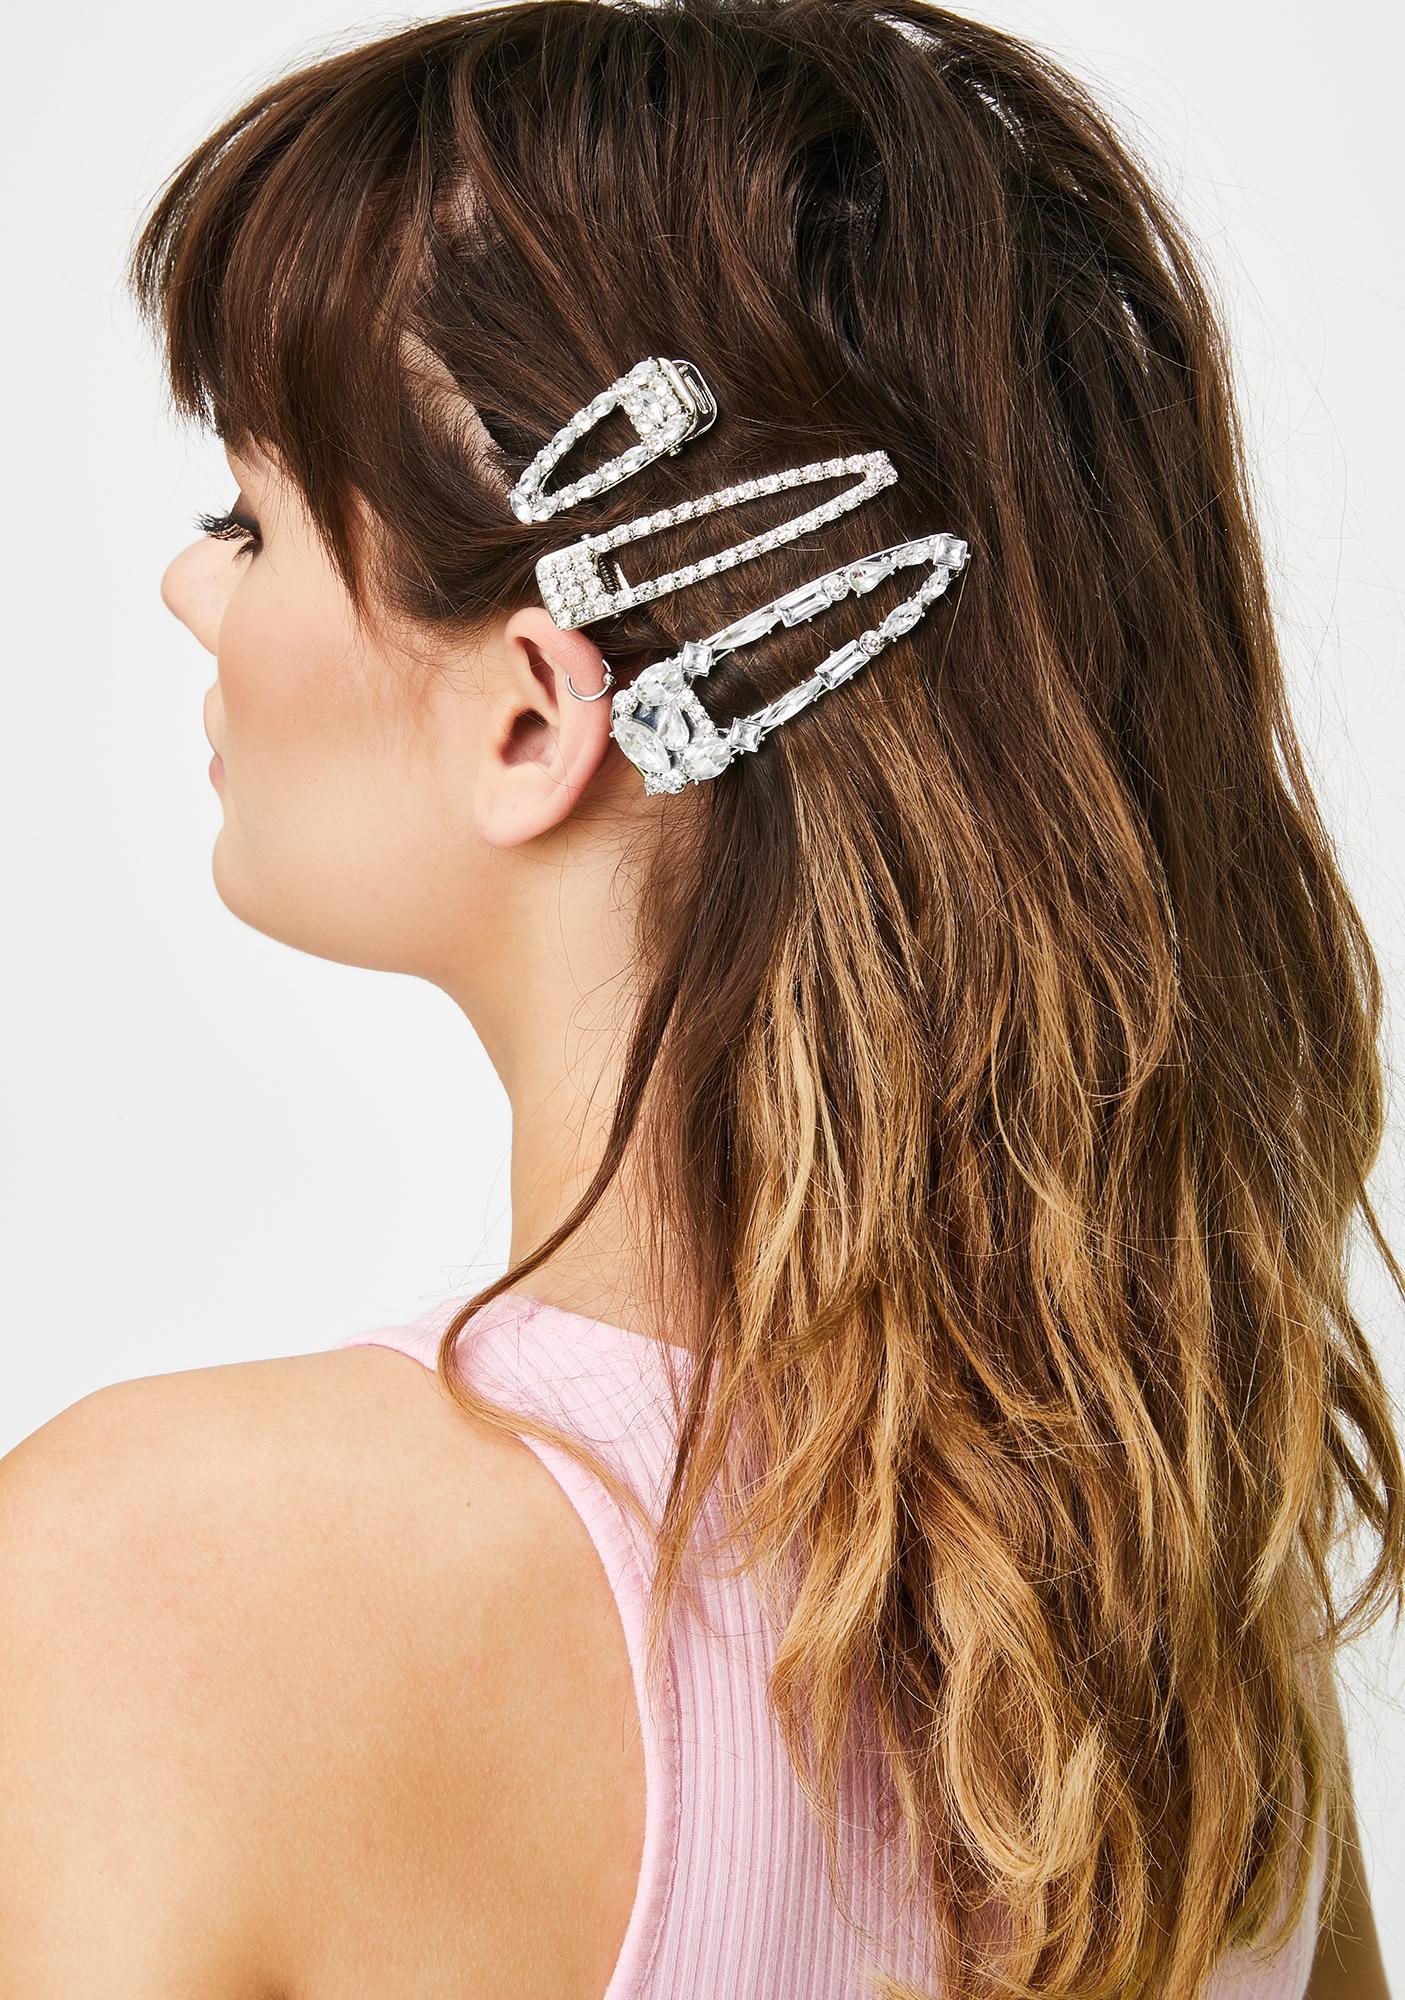 Everlasting Luster Rhinestone Hair Clips